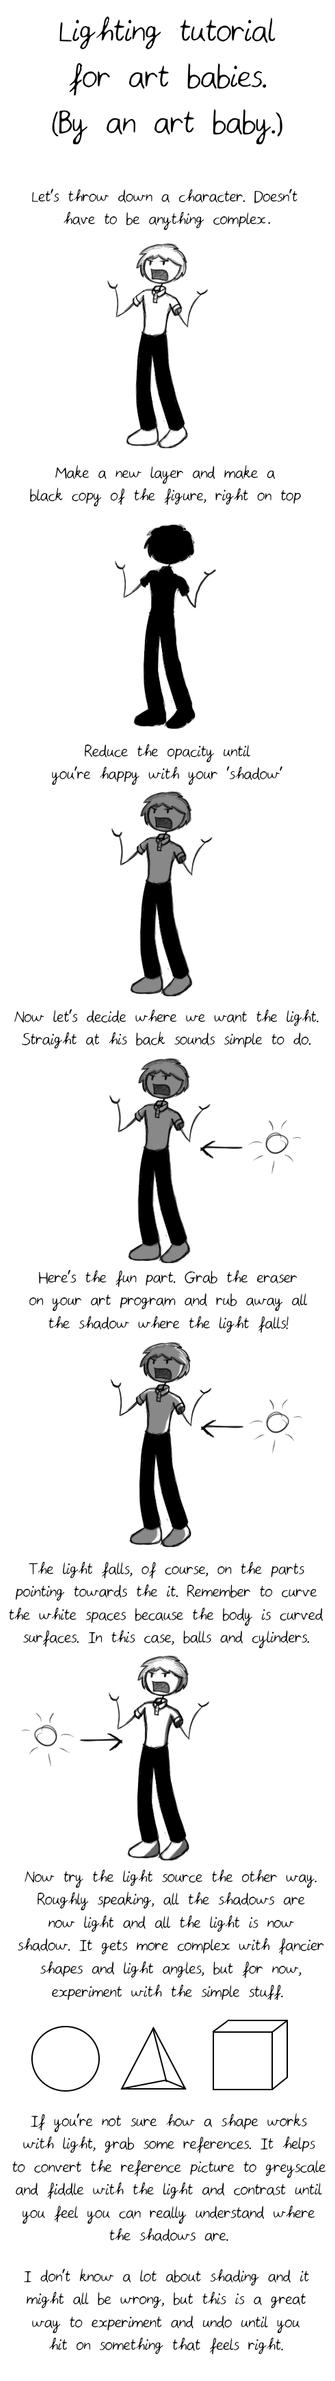 Very basic lighting tutorial by Desert-Lilly